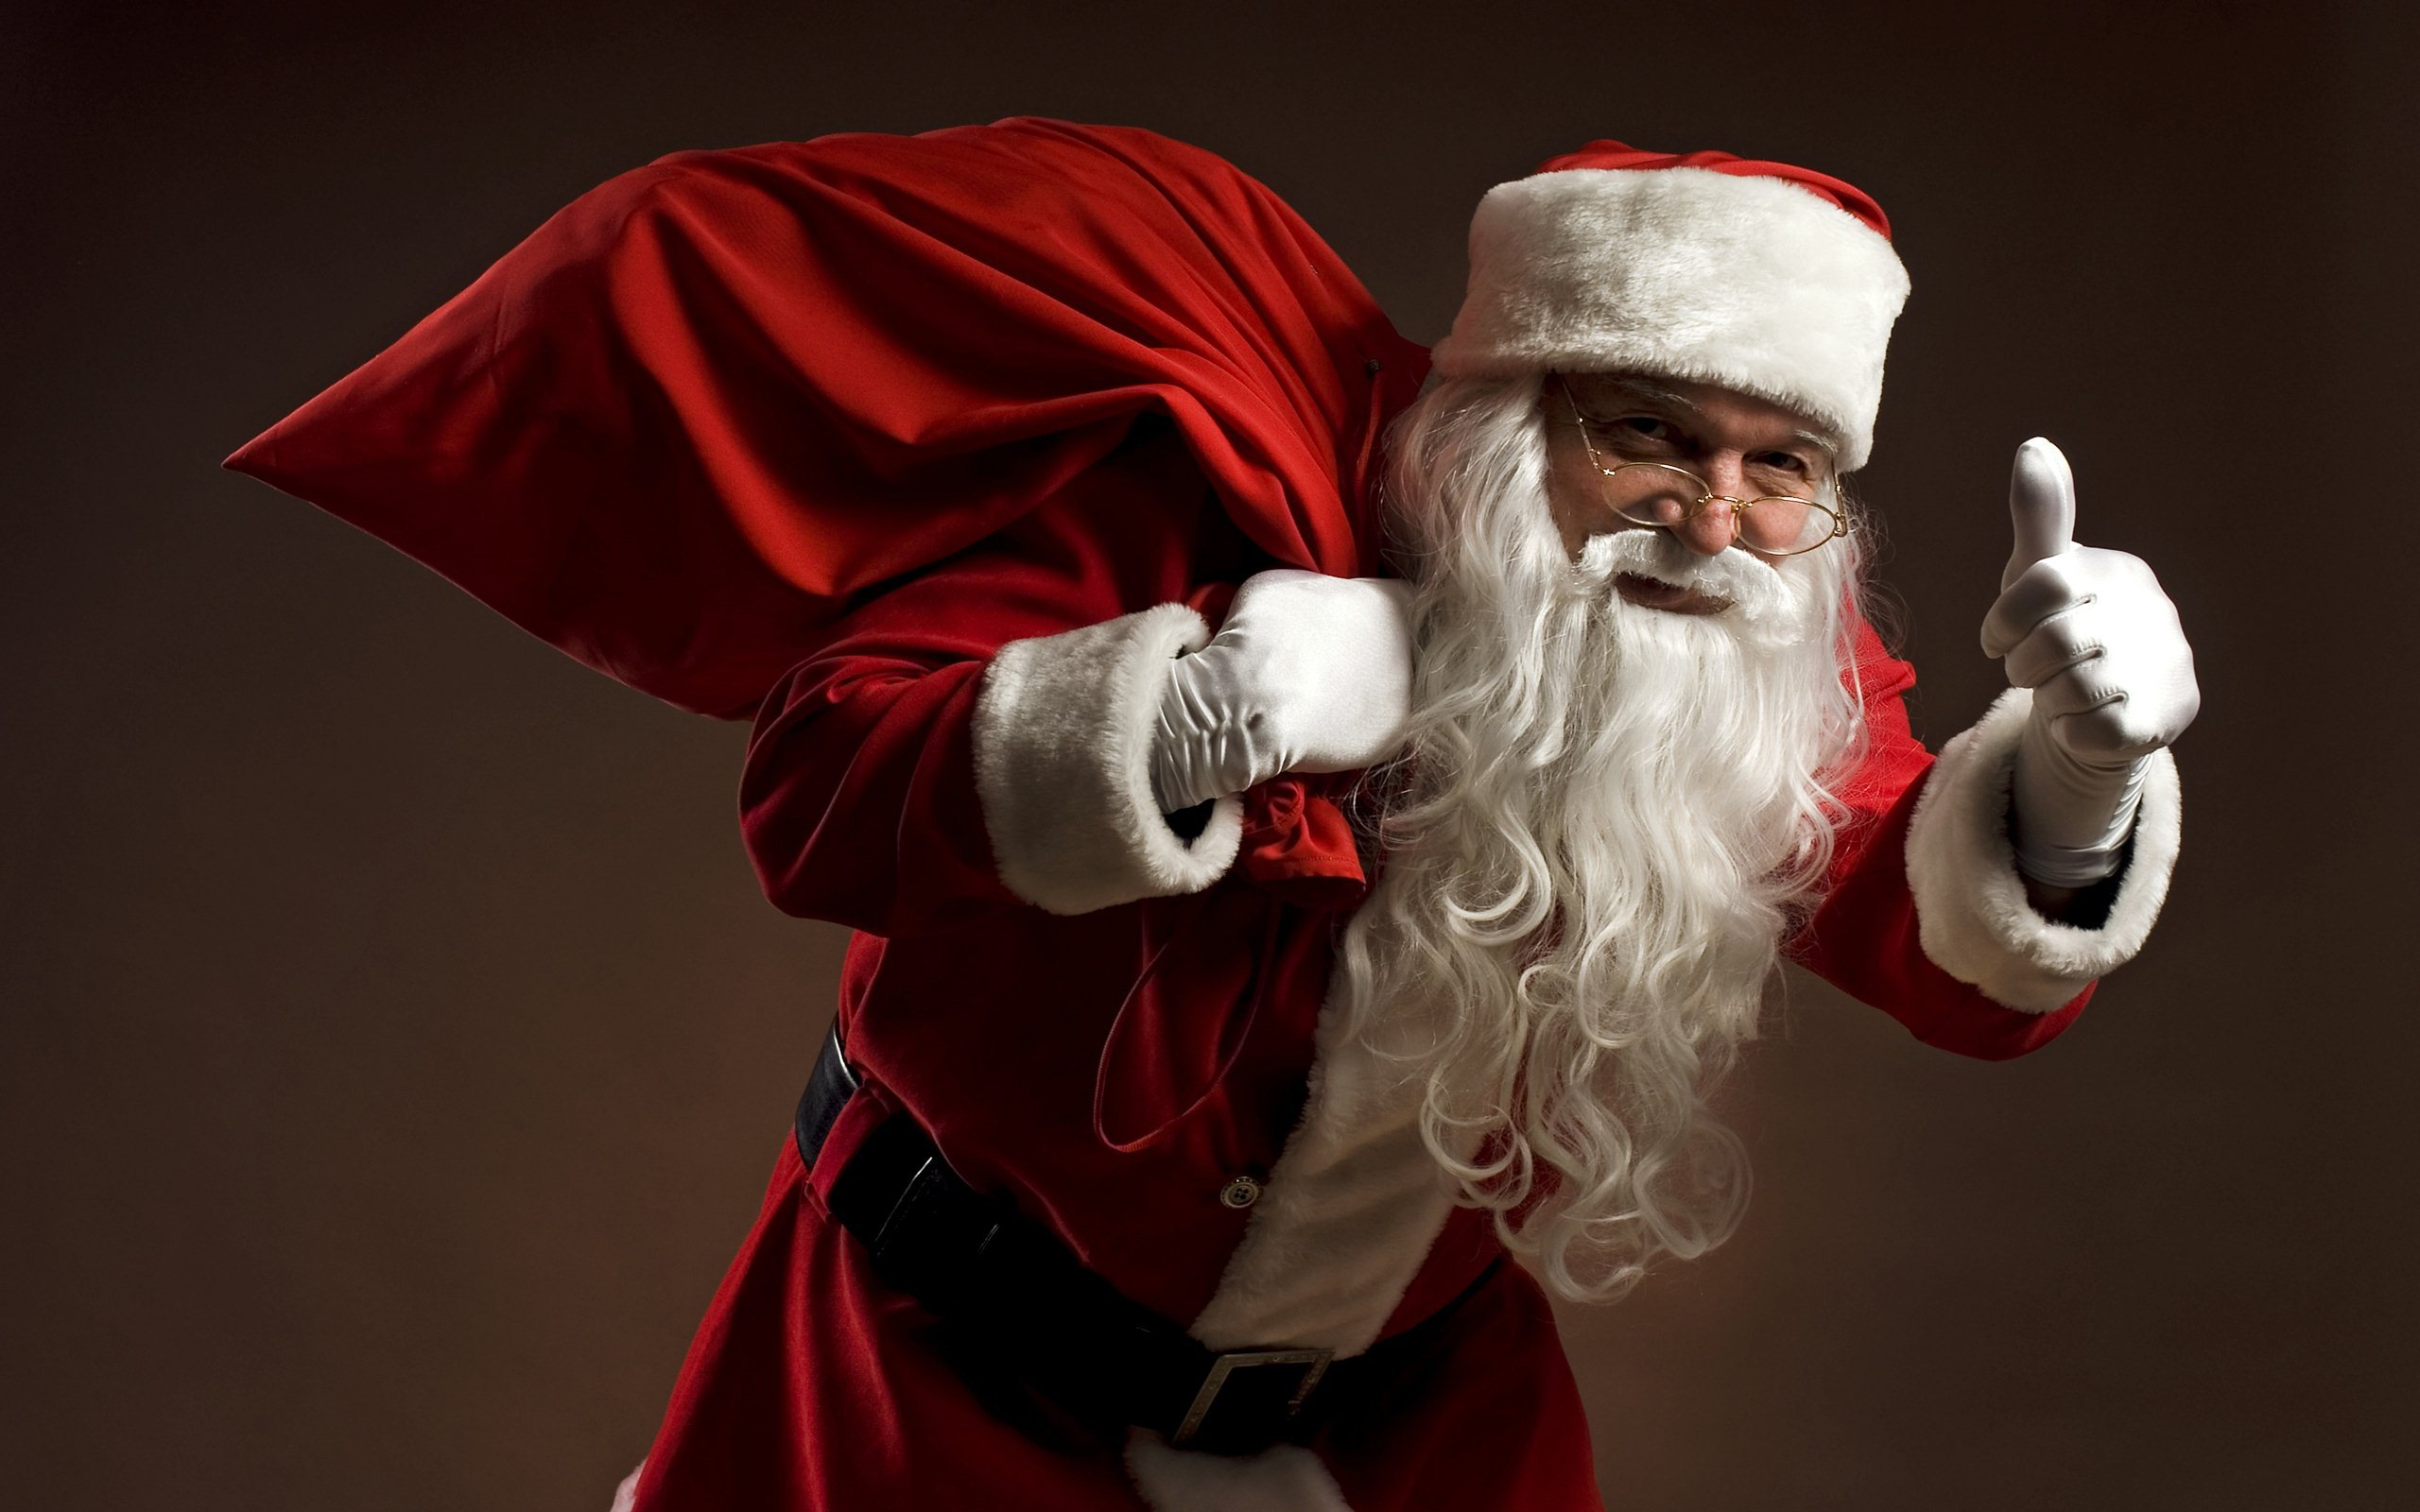 Santa-Claus-HD-Background-.jpg